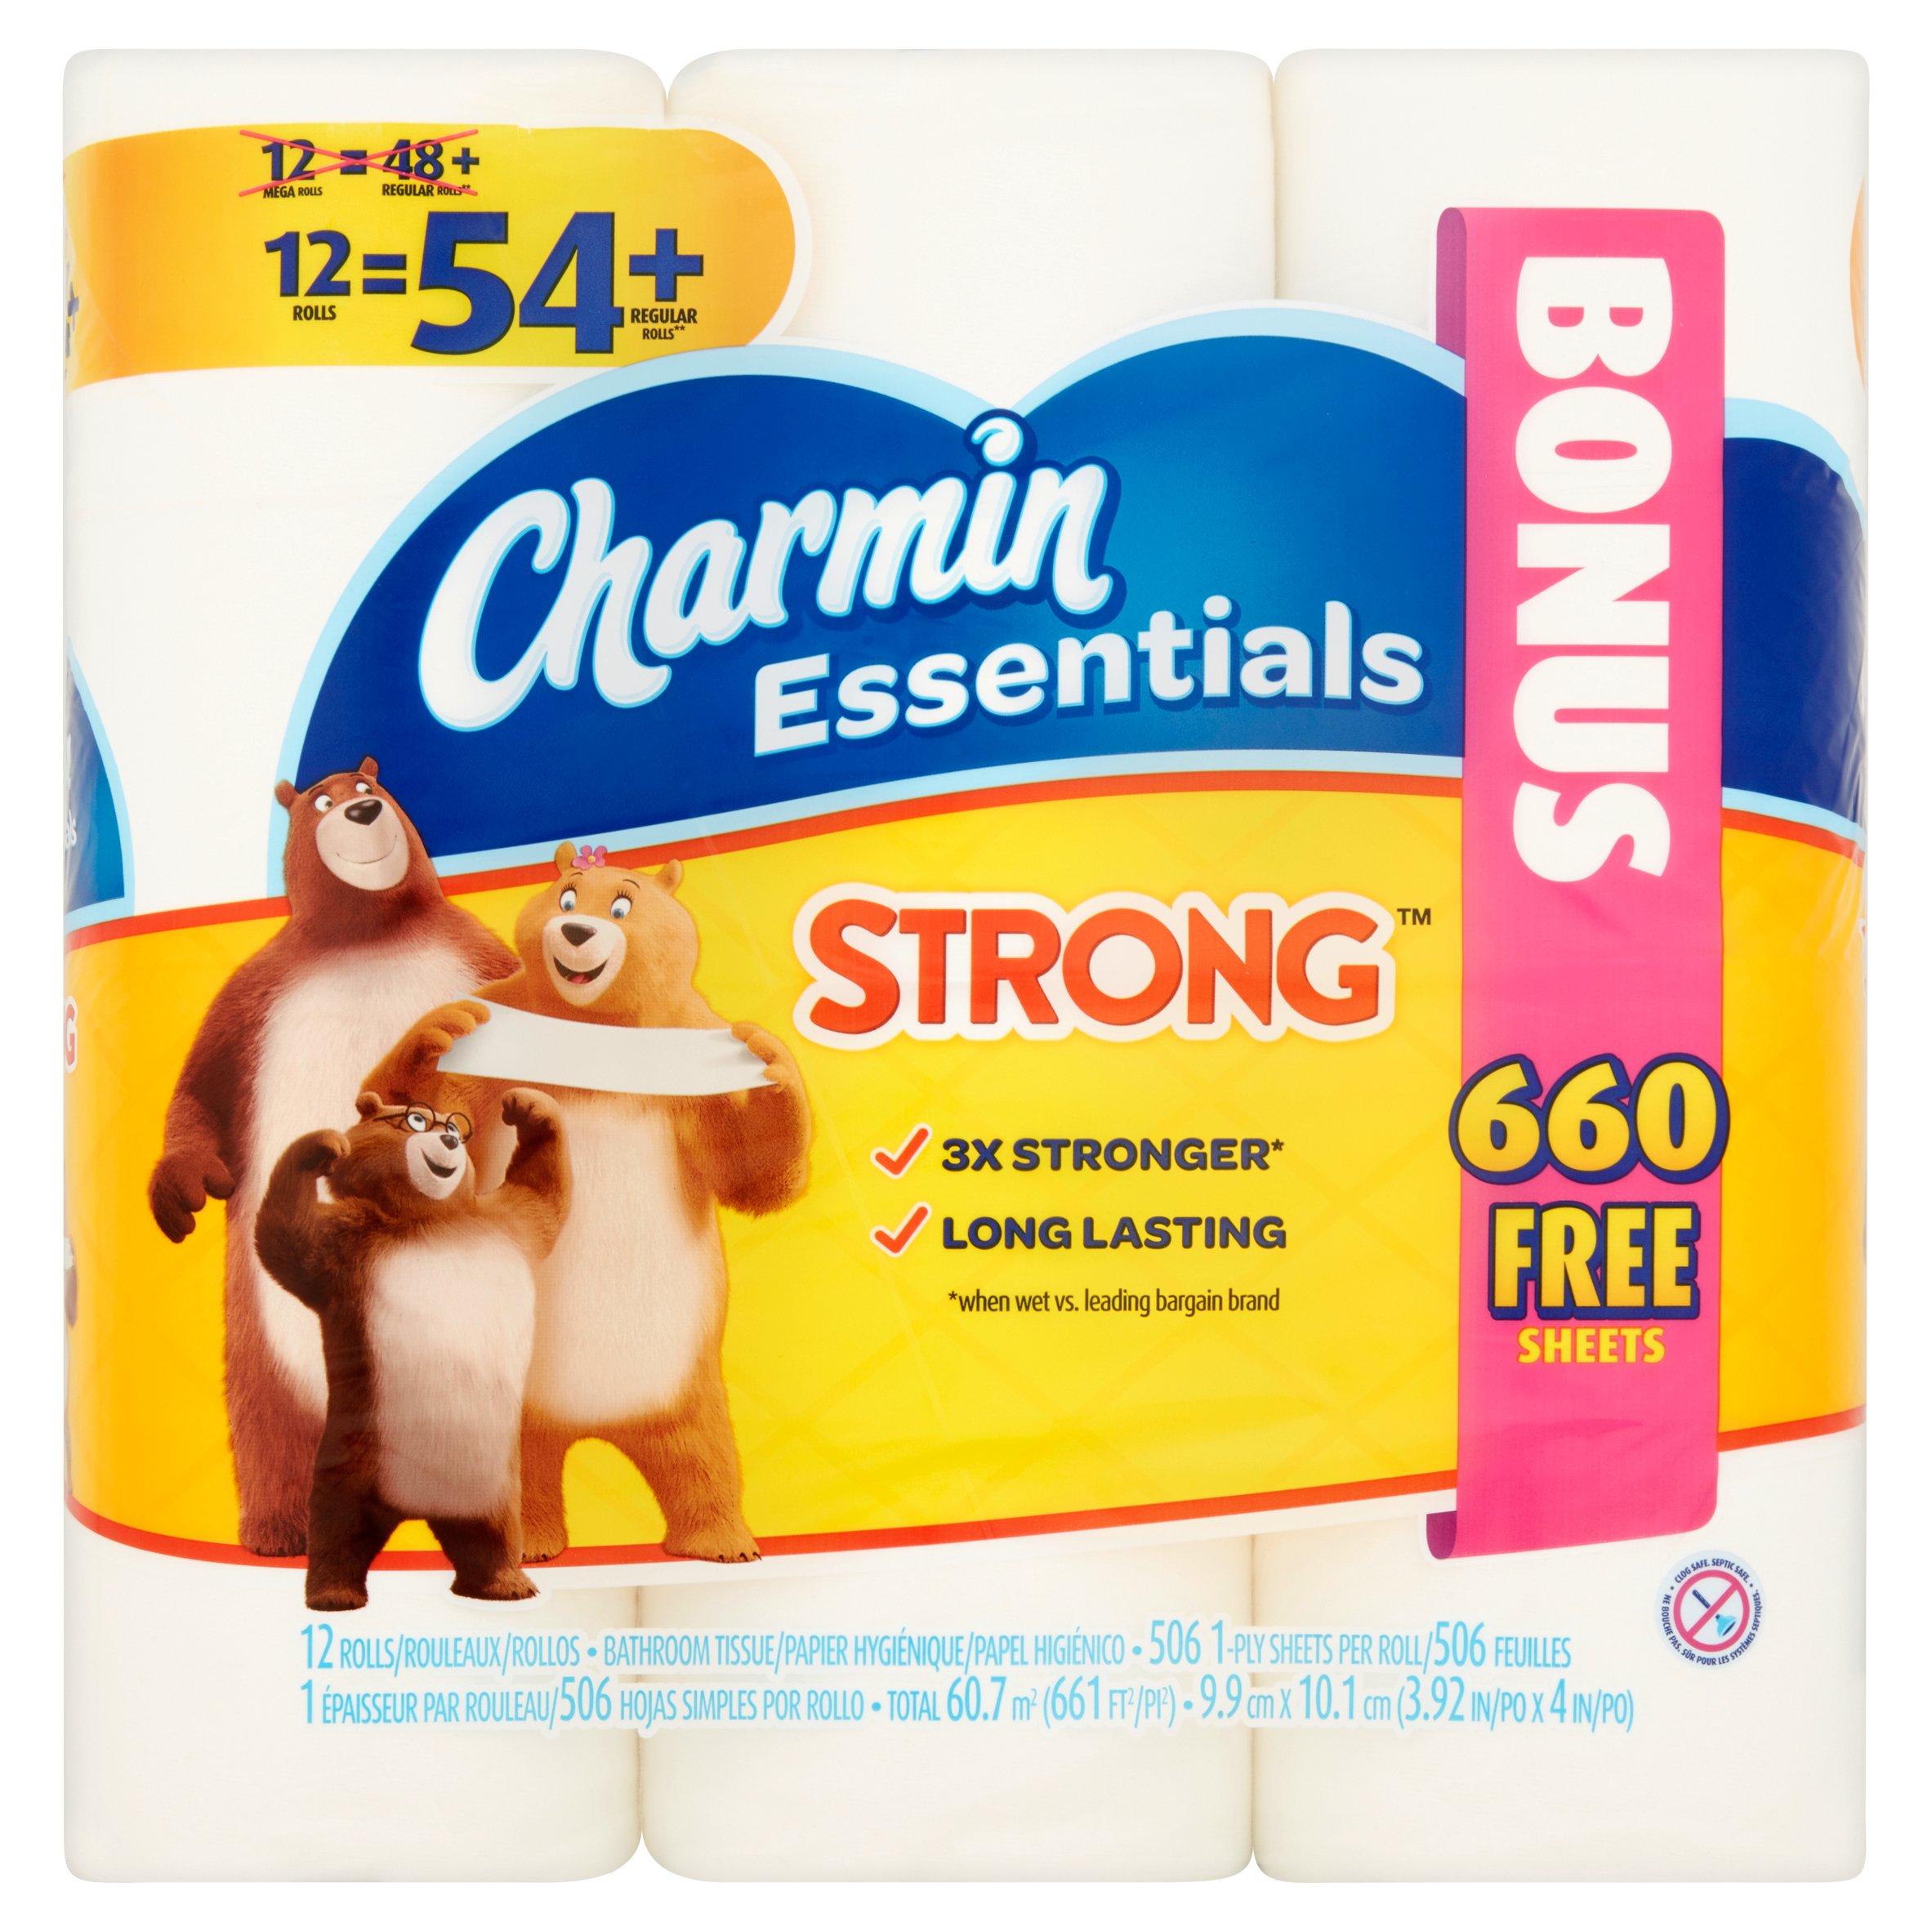 Charmin Bathroom Tissue charmin essentials strong bathroom tissue rolls, 12 count